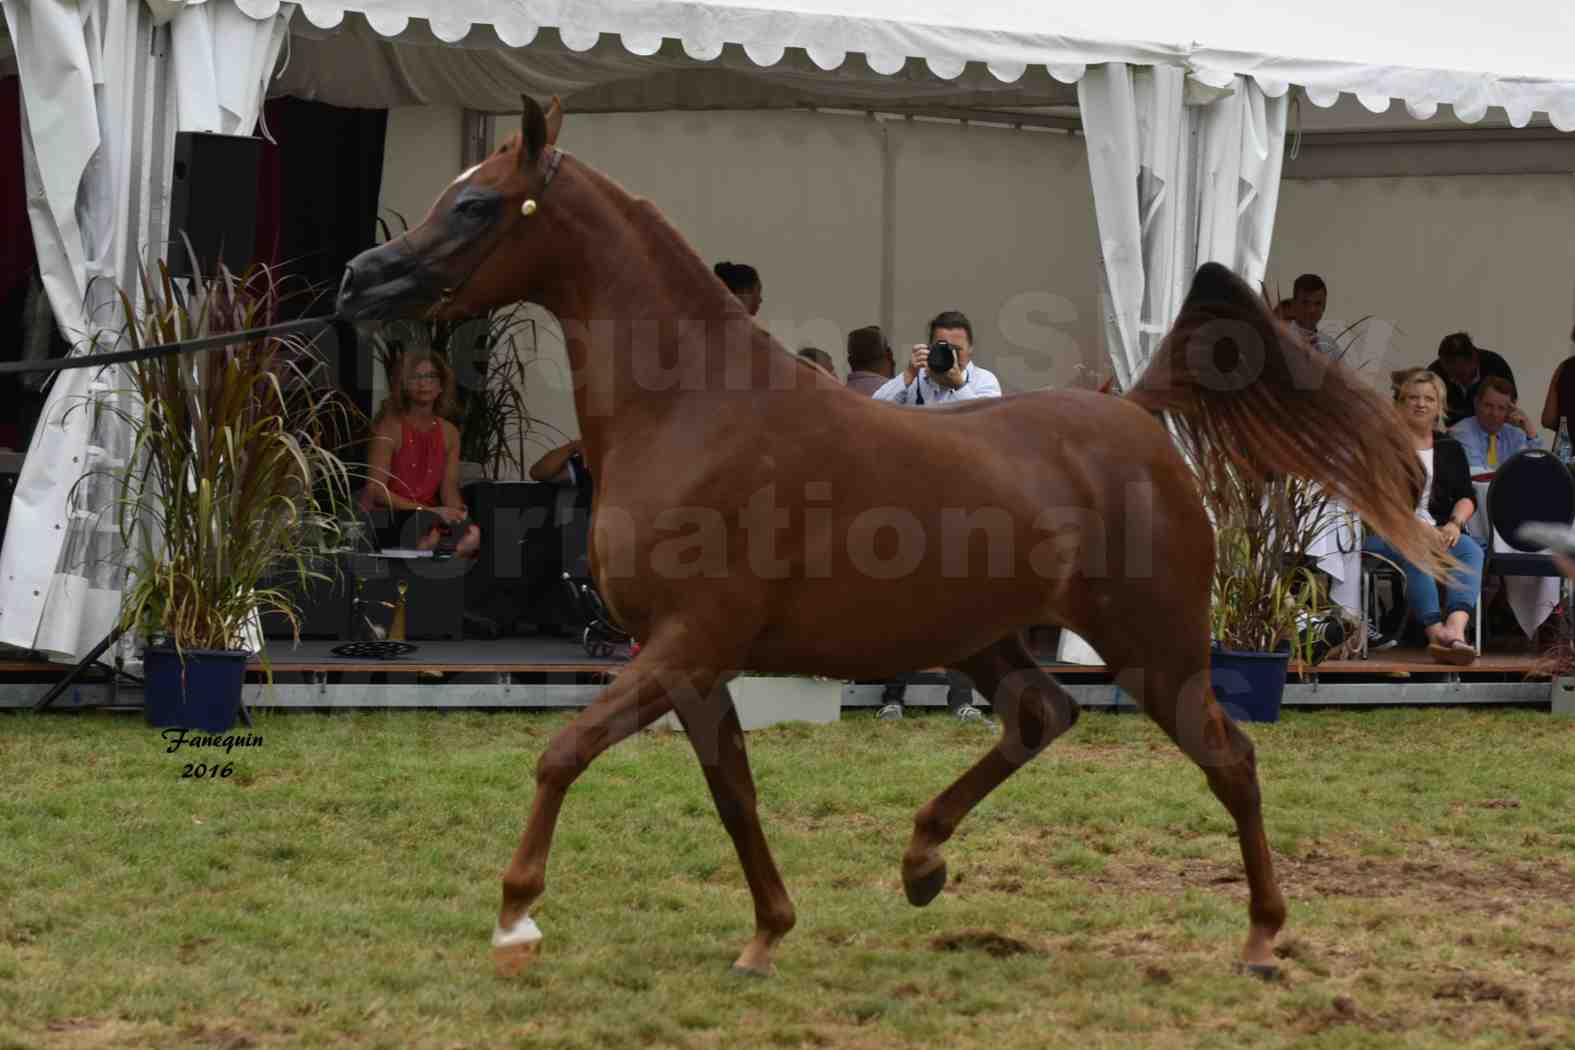 International Arabian Horse Show B de VICHY 2016 - PEARL DE DJOON - Notre Sélection - 23